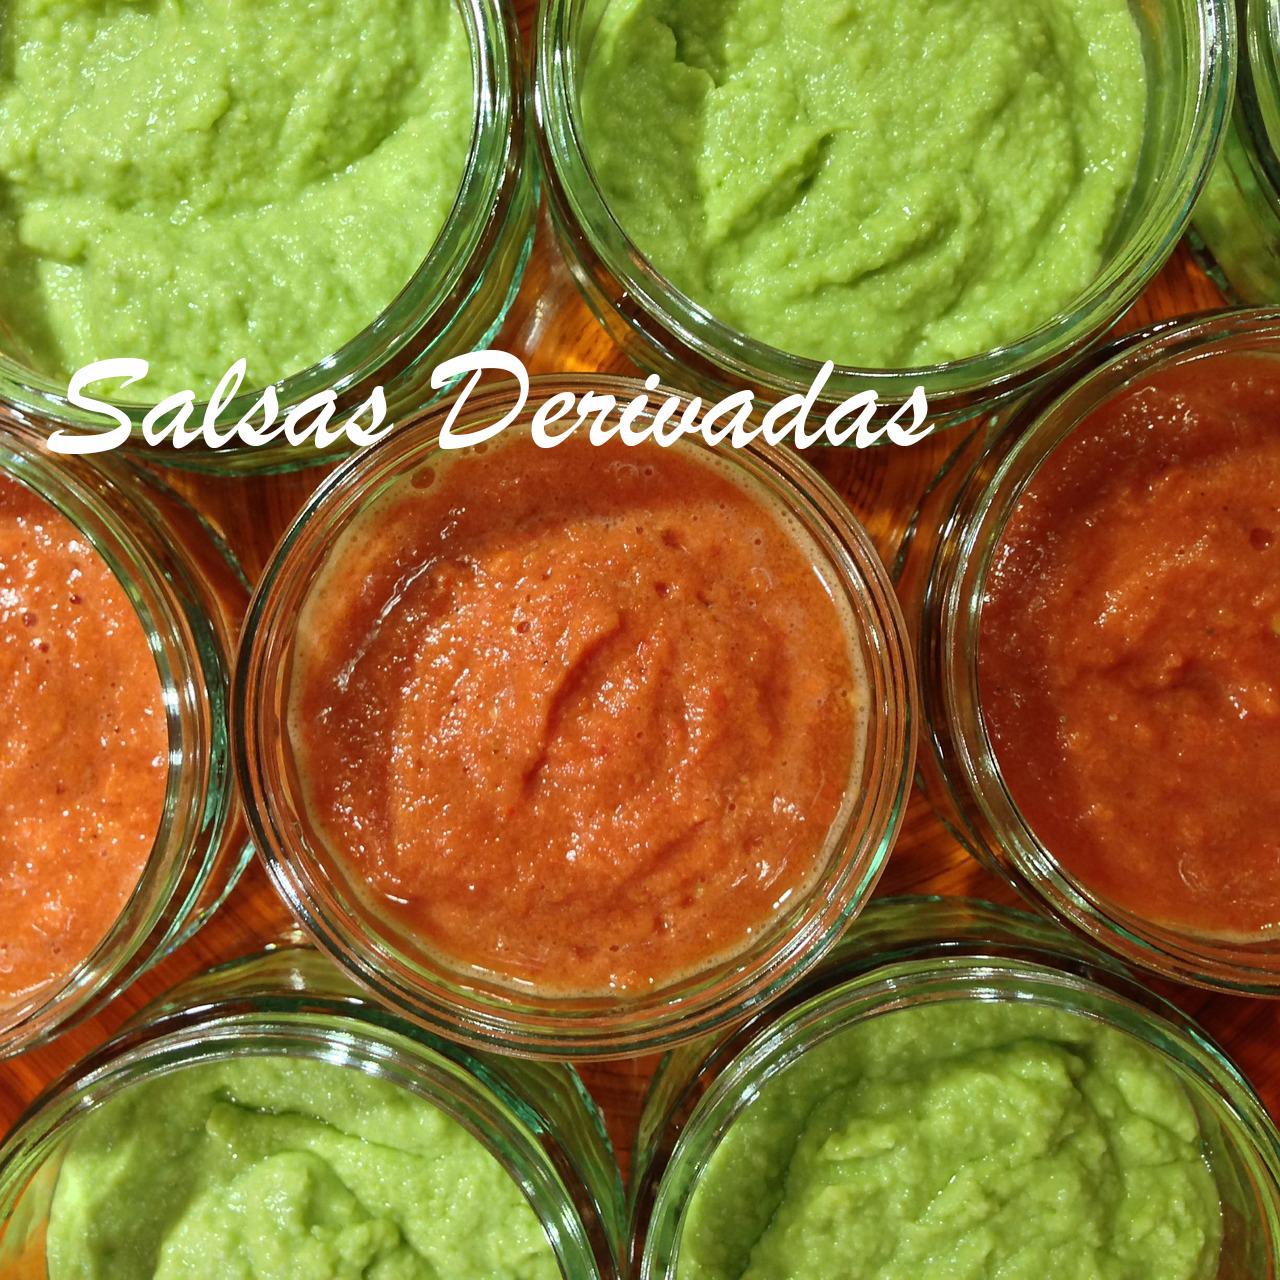 salsas derivadas